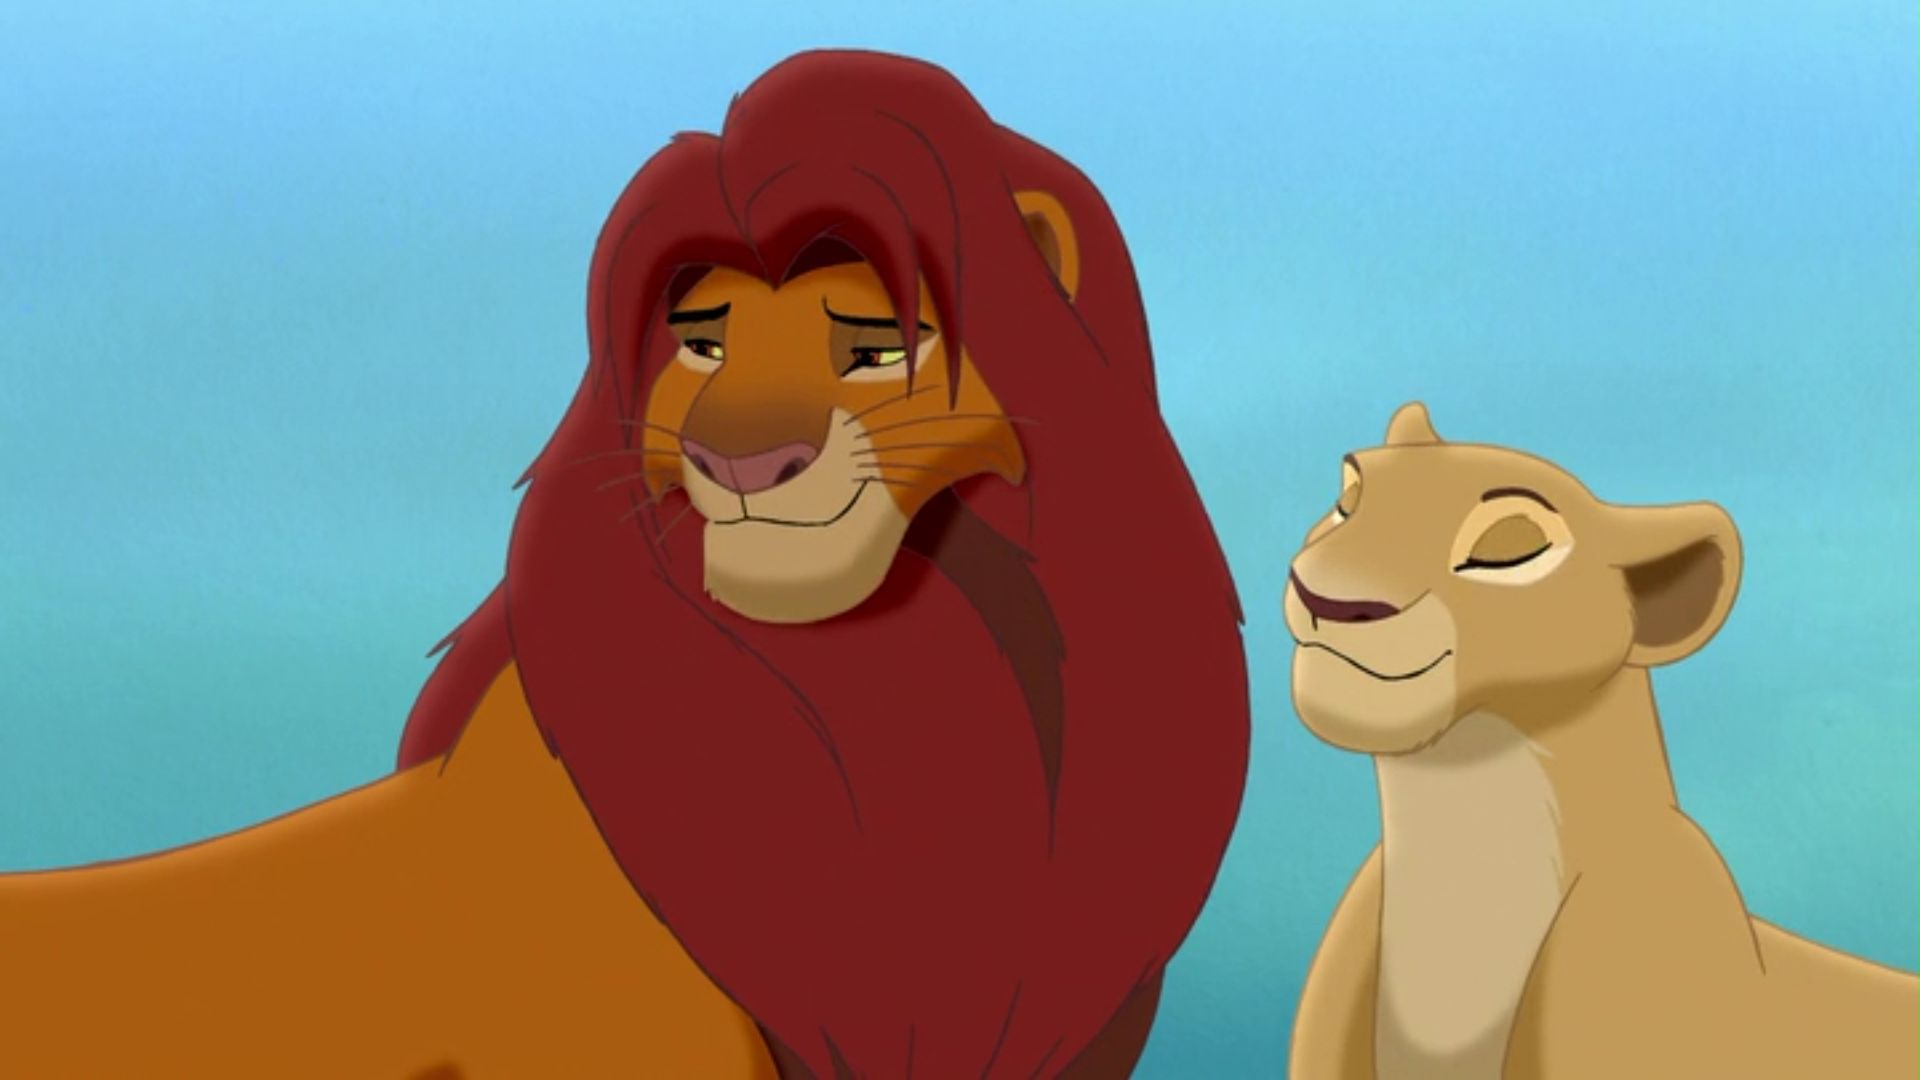 7e6bddf45 Lion King 2: Simba's Pride, The - TLK 2 0664 - Animation Movies ...